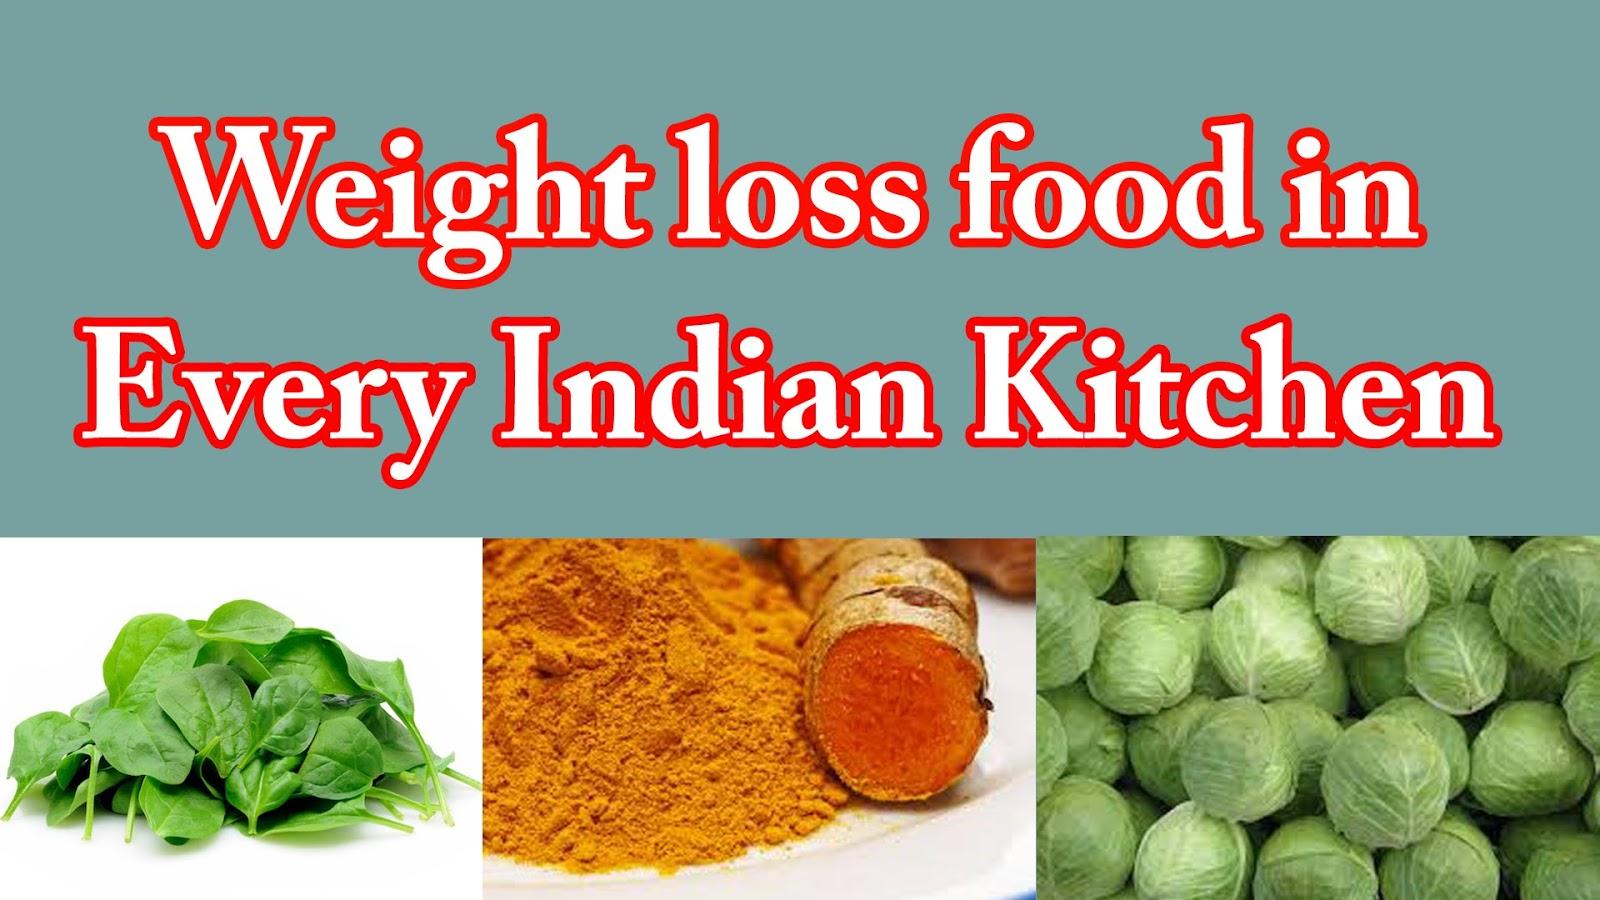 Herbal medicine for obesity image 2